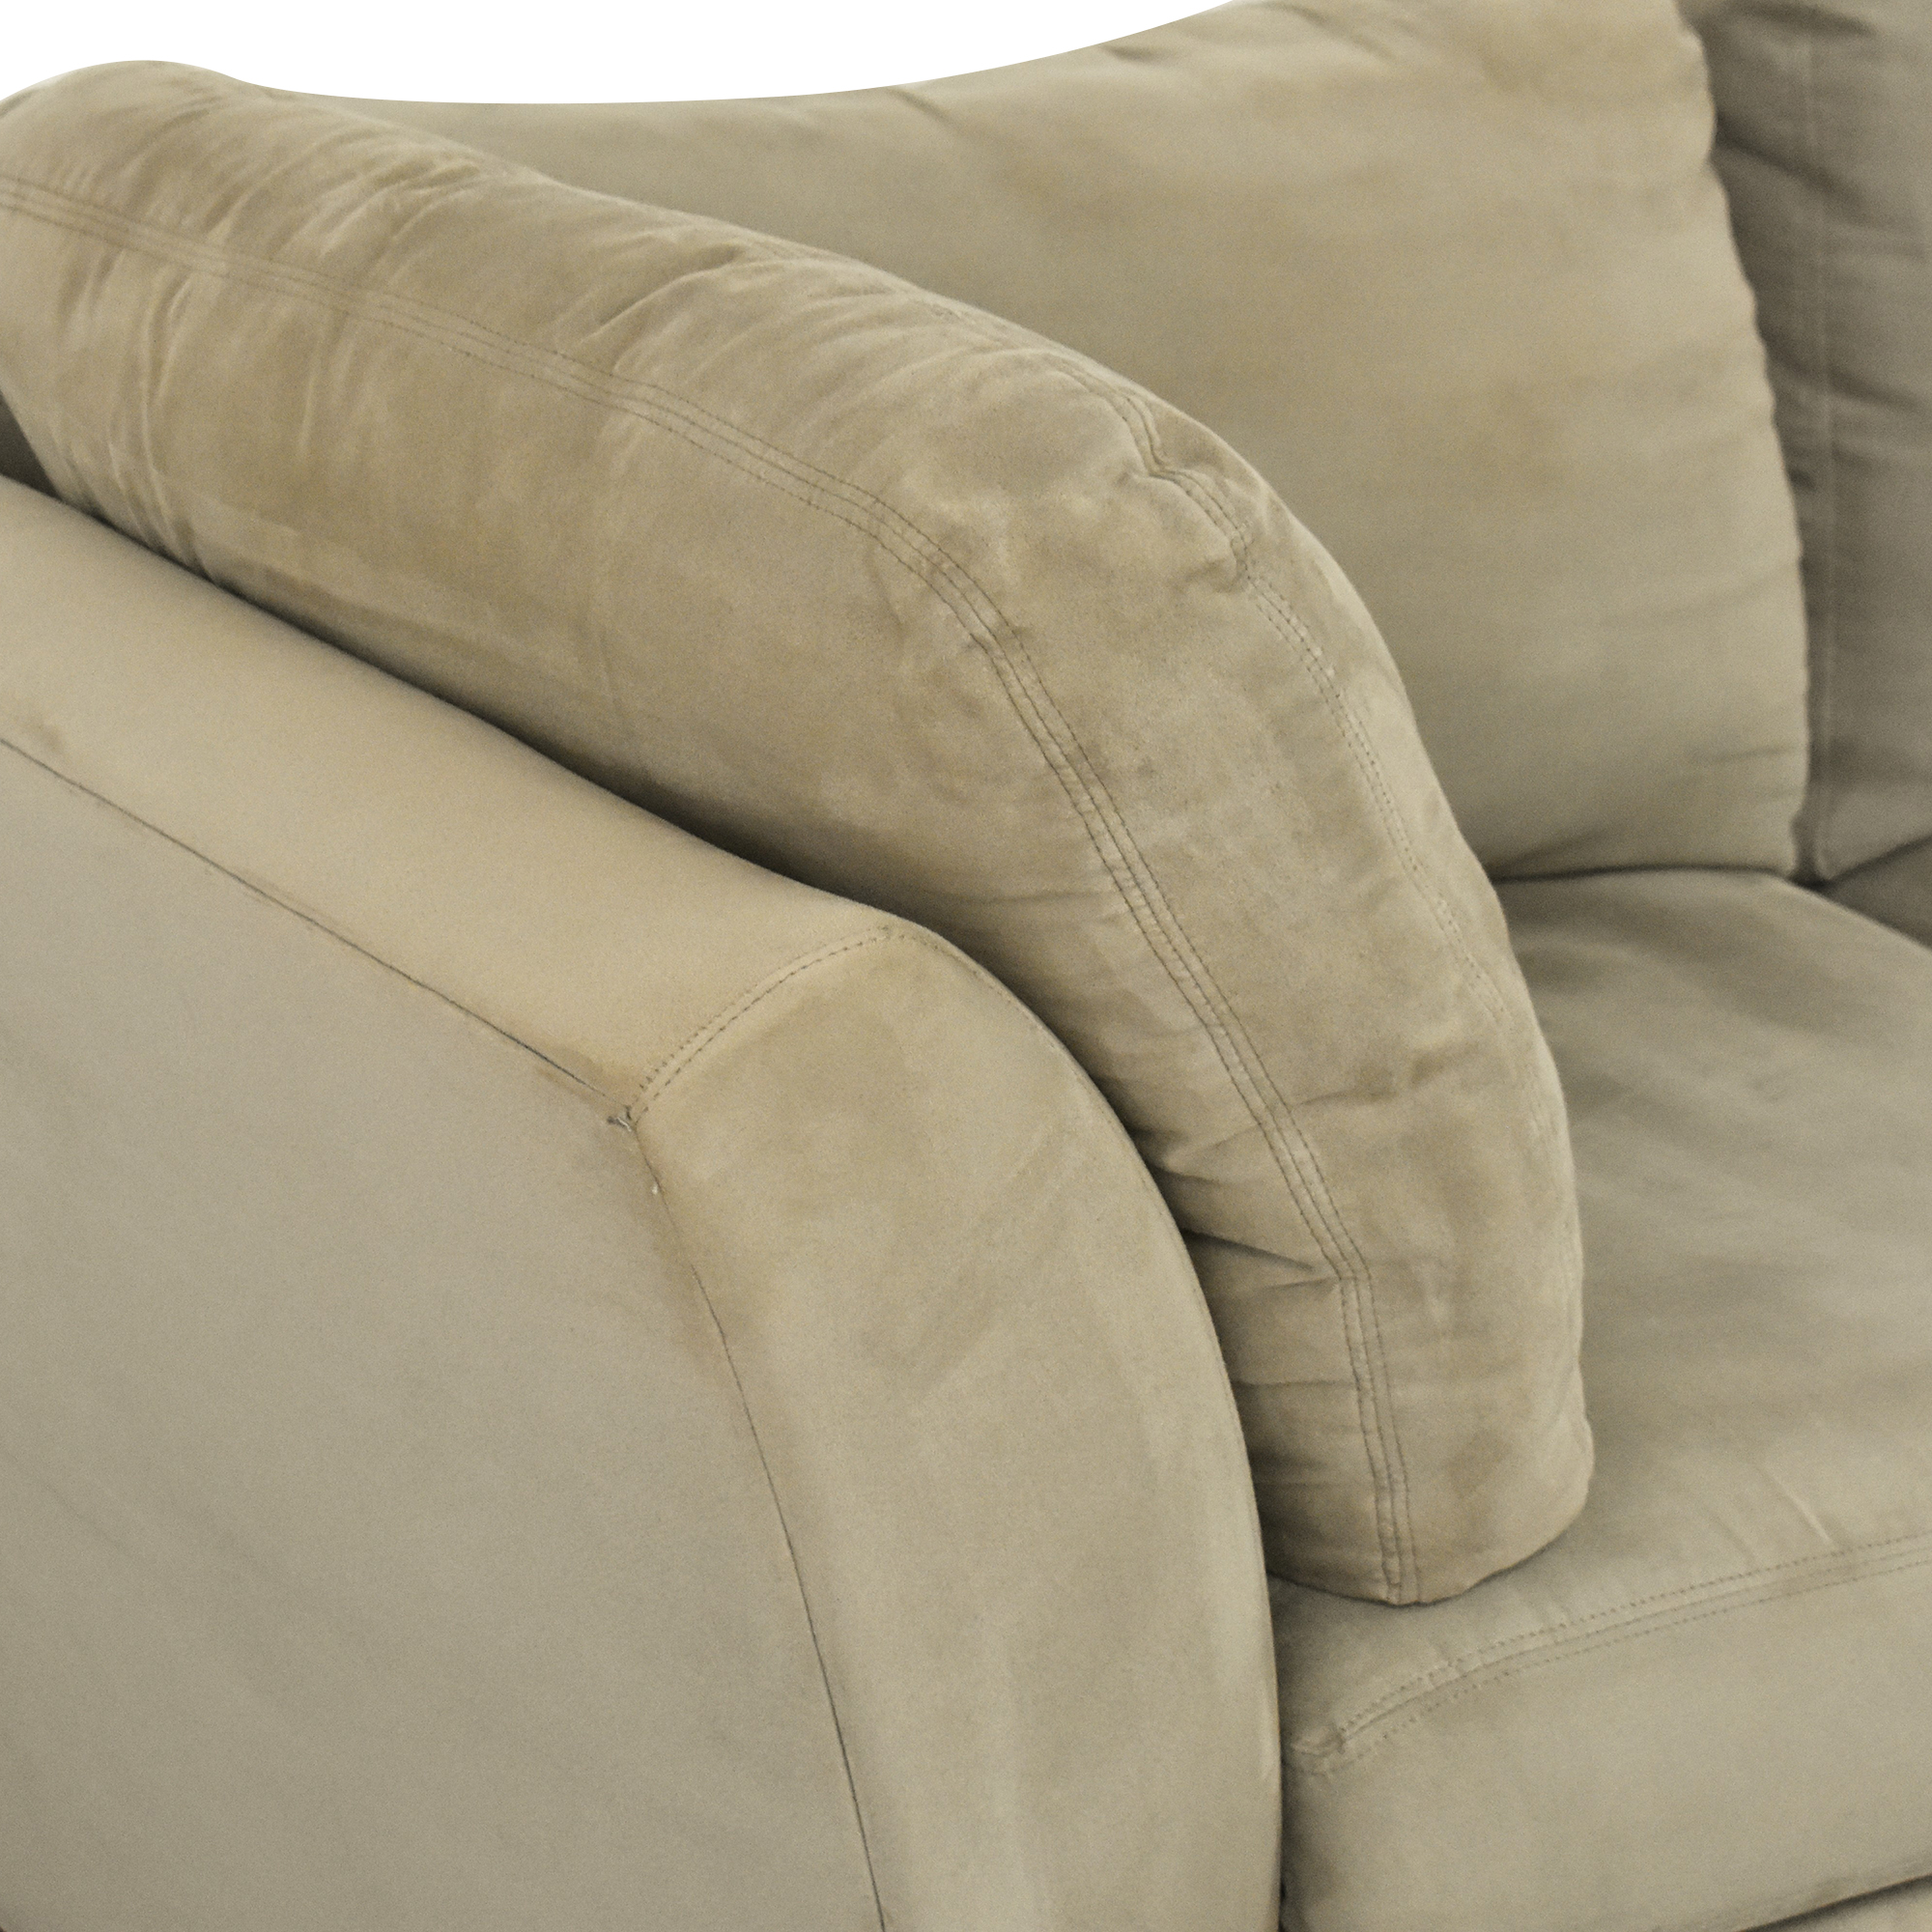 Raymour & Flanigan Raymour & Flanigan Modular Sofa